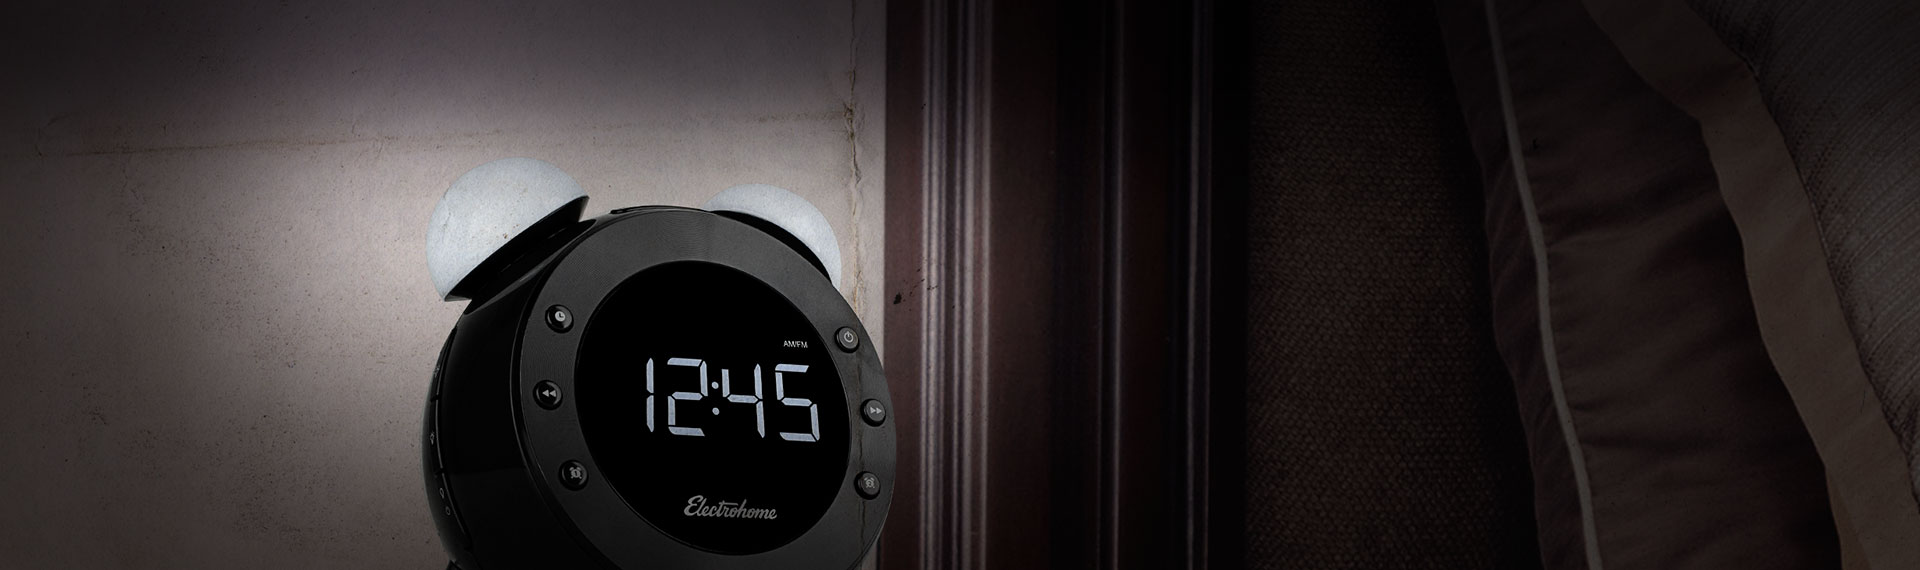 CR35 Clock Radio battery